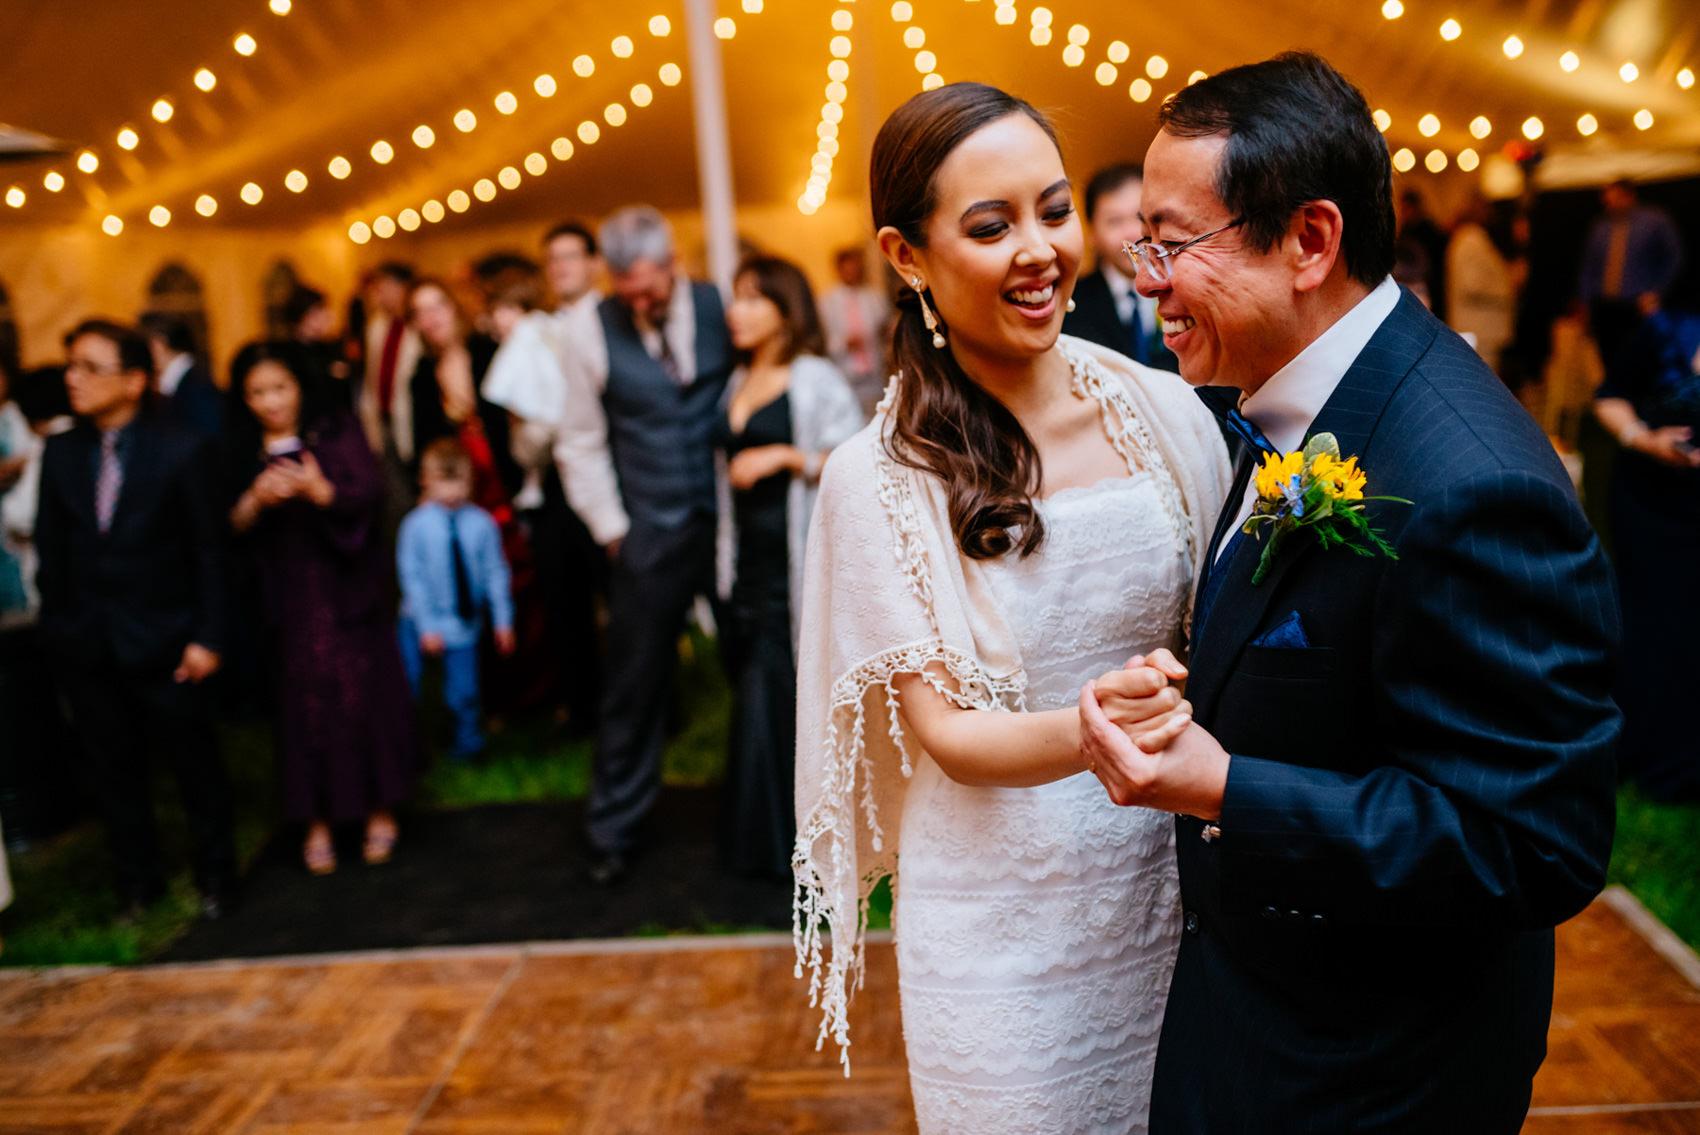 035-oberports-wedding-reception-portfolio